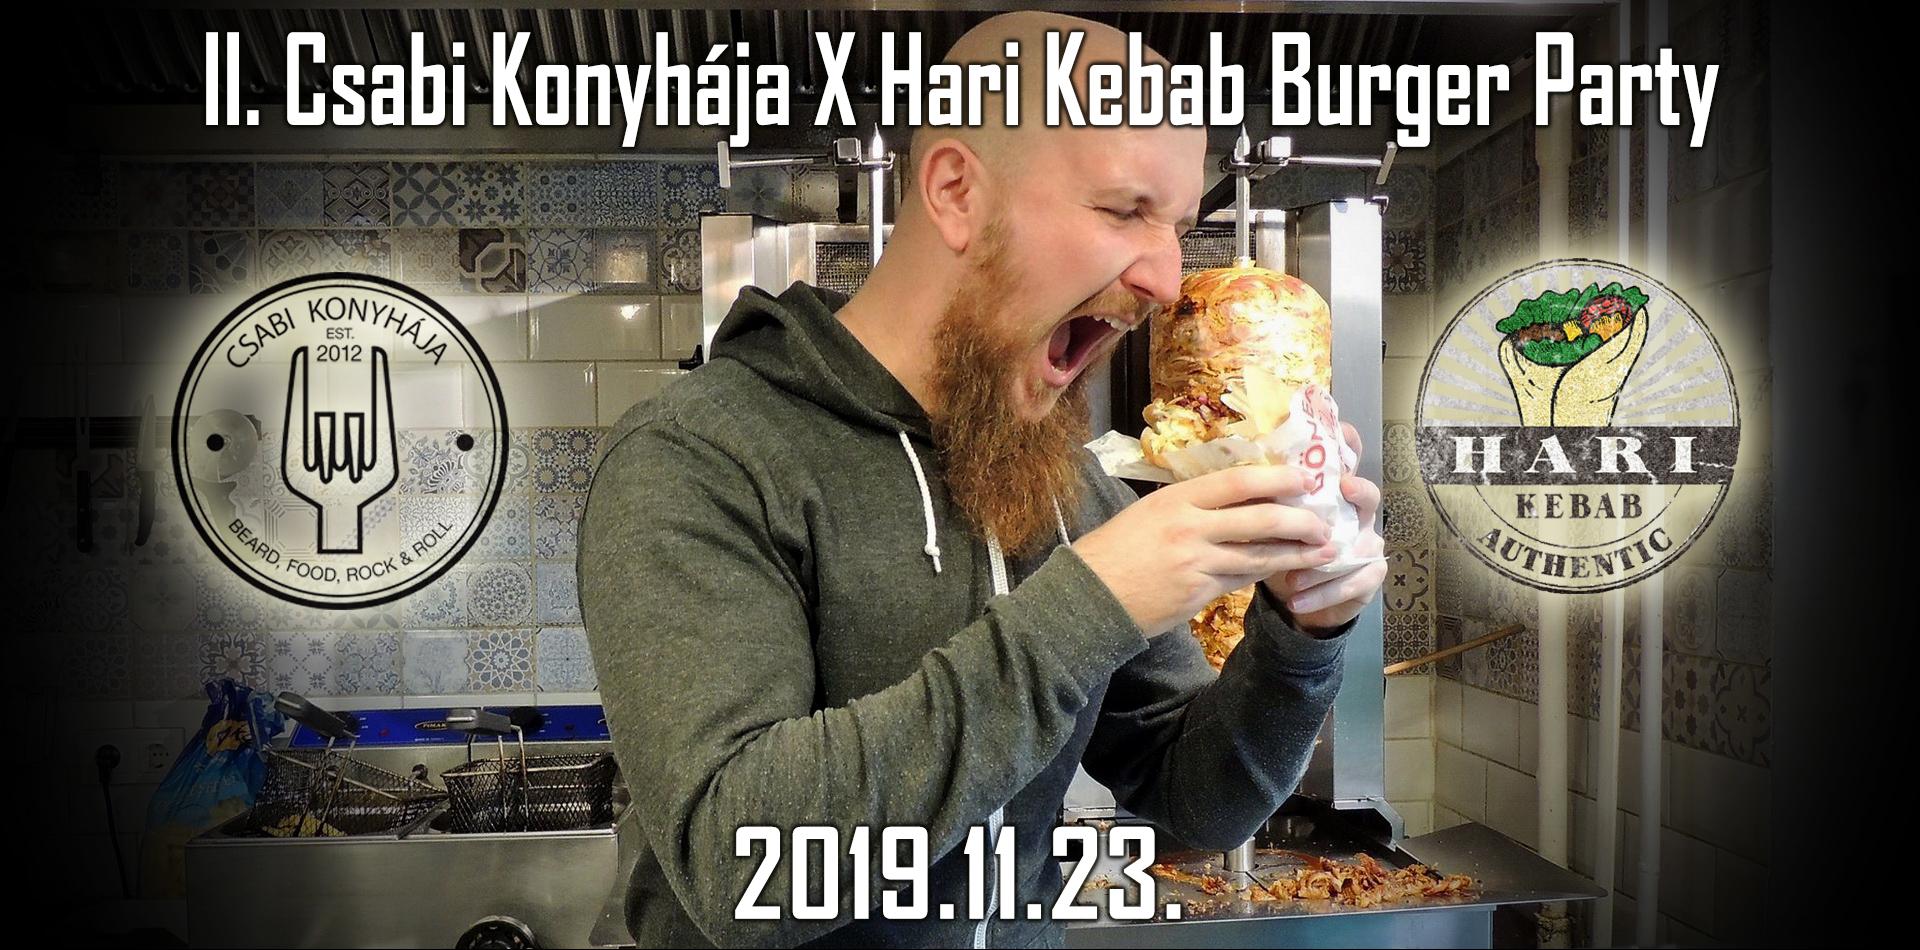 hariburger.jpg